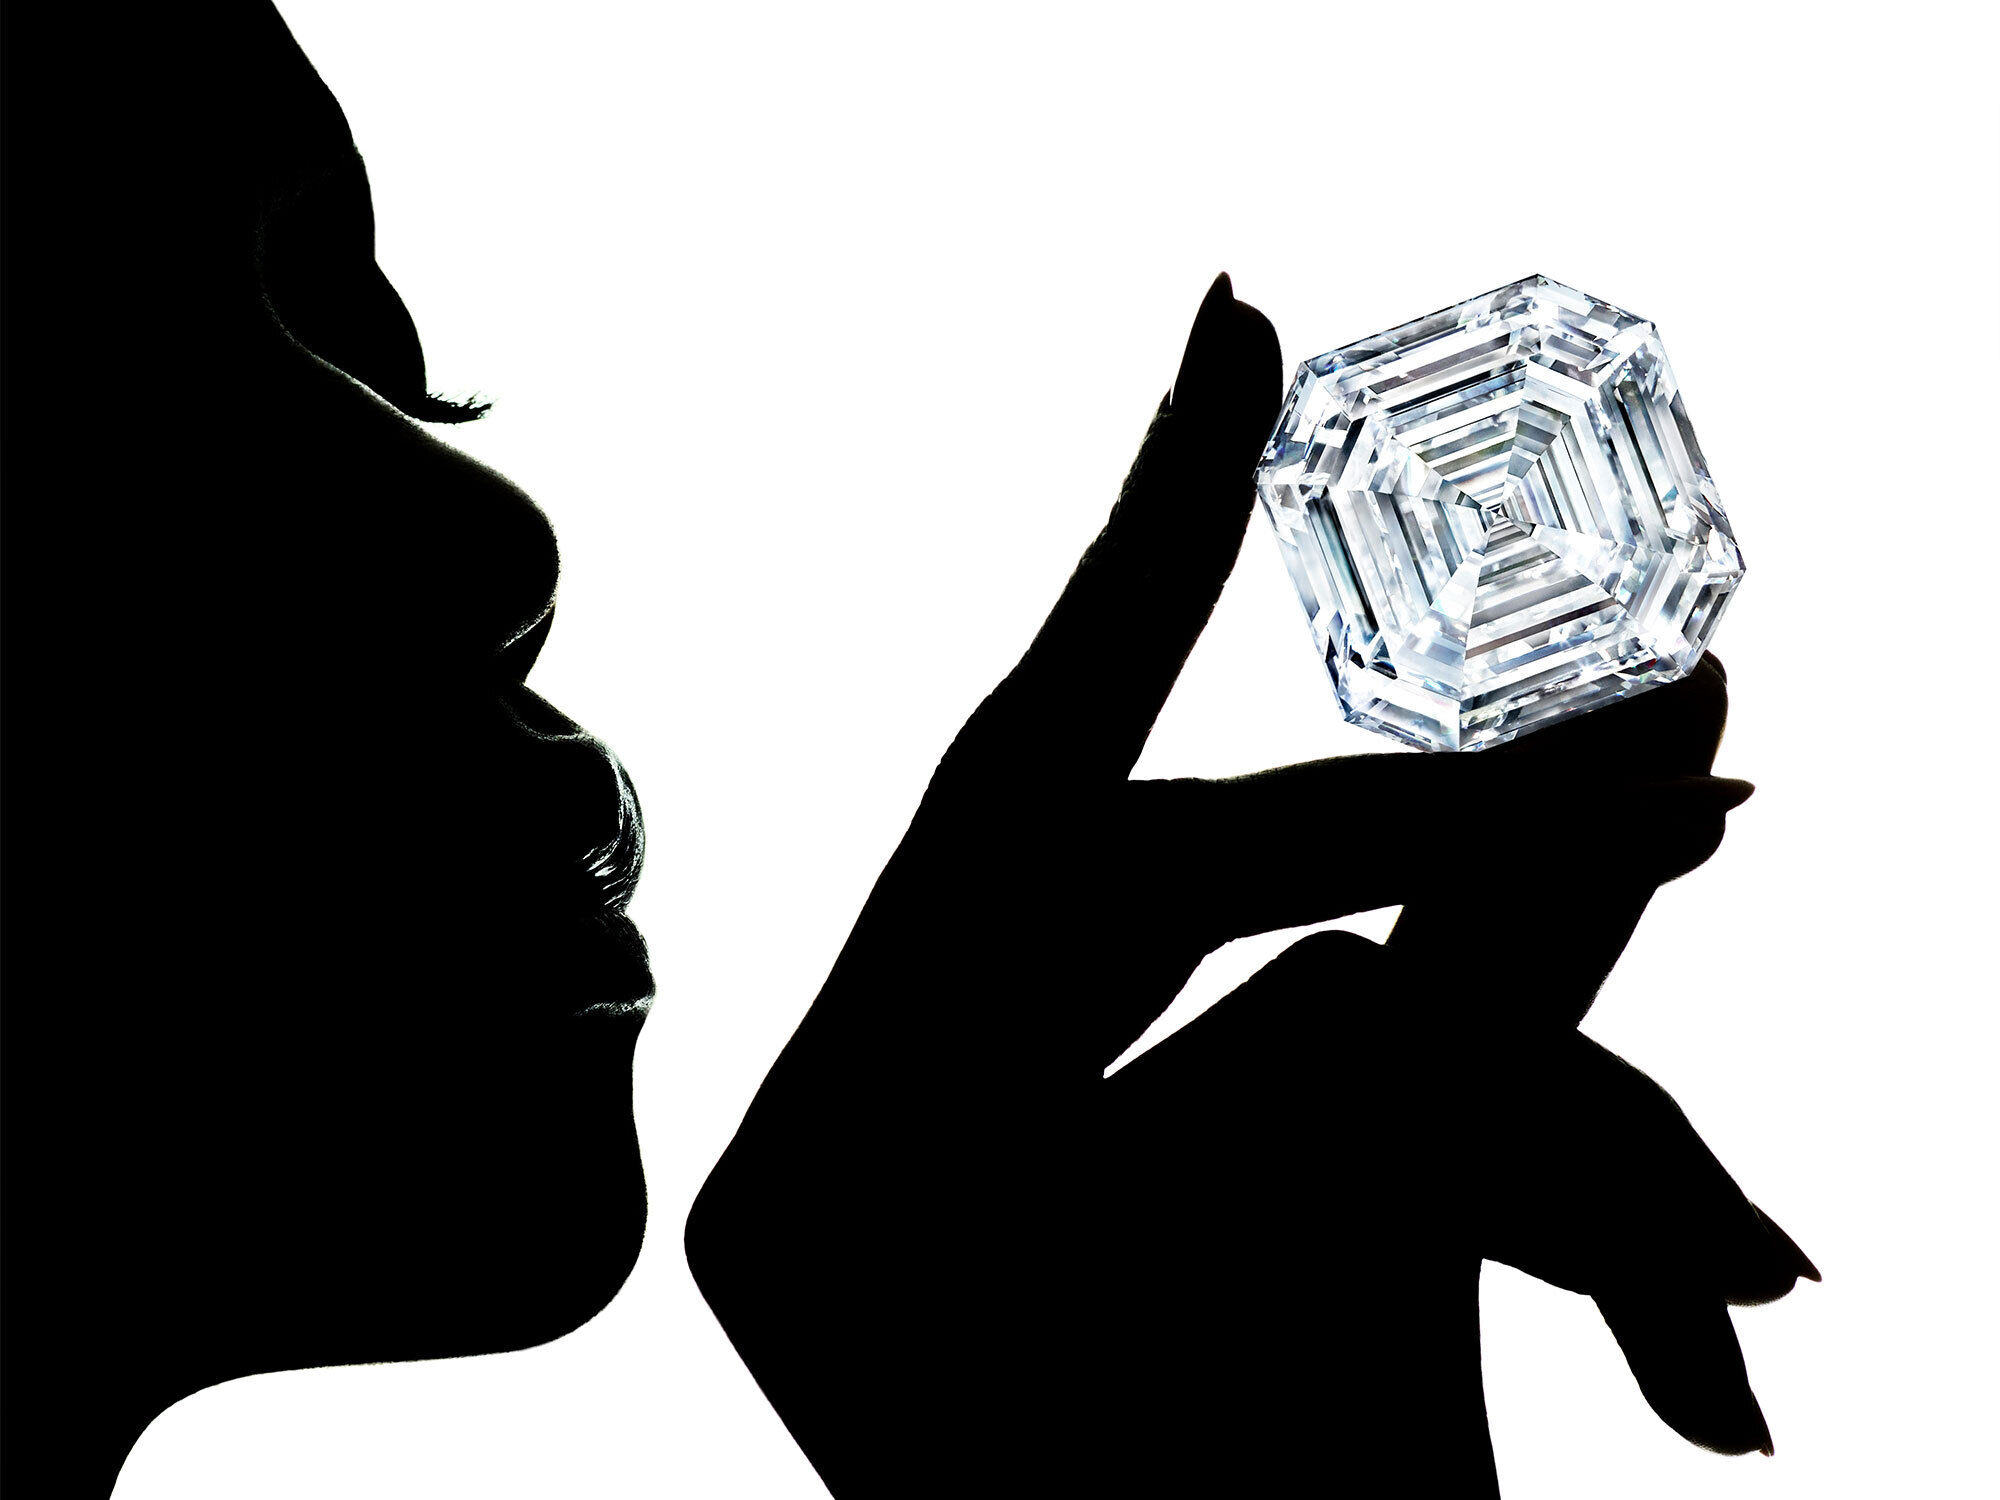 Shadow of model holding the Graff Lesedi La Rona diamond.